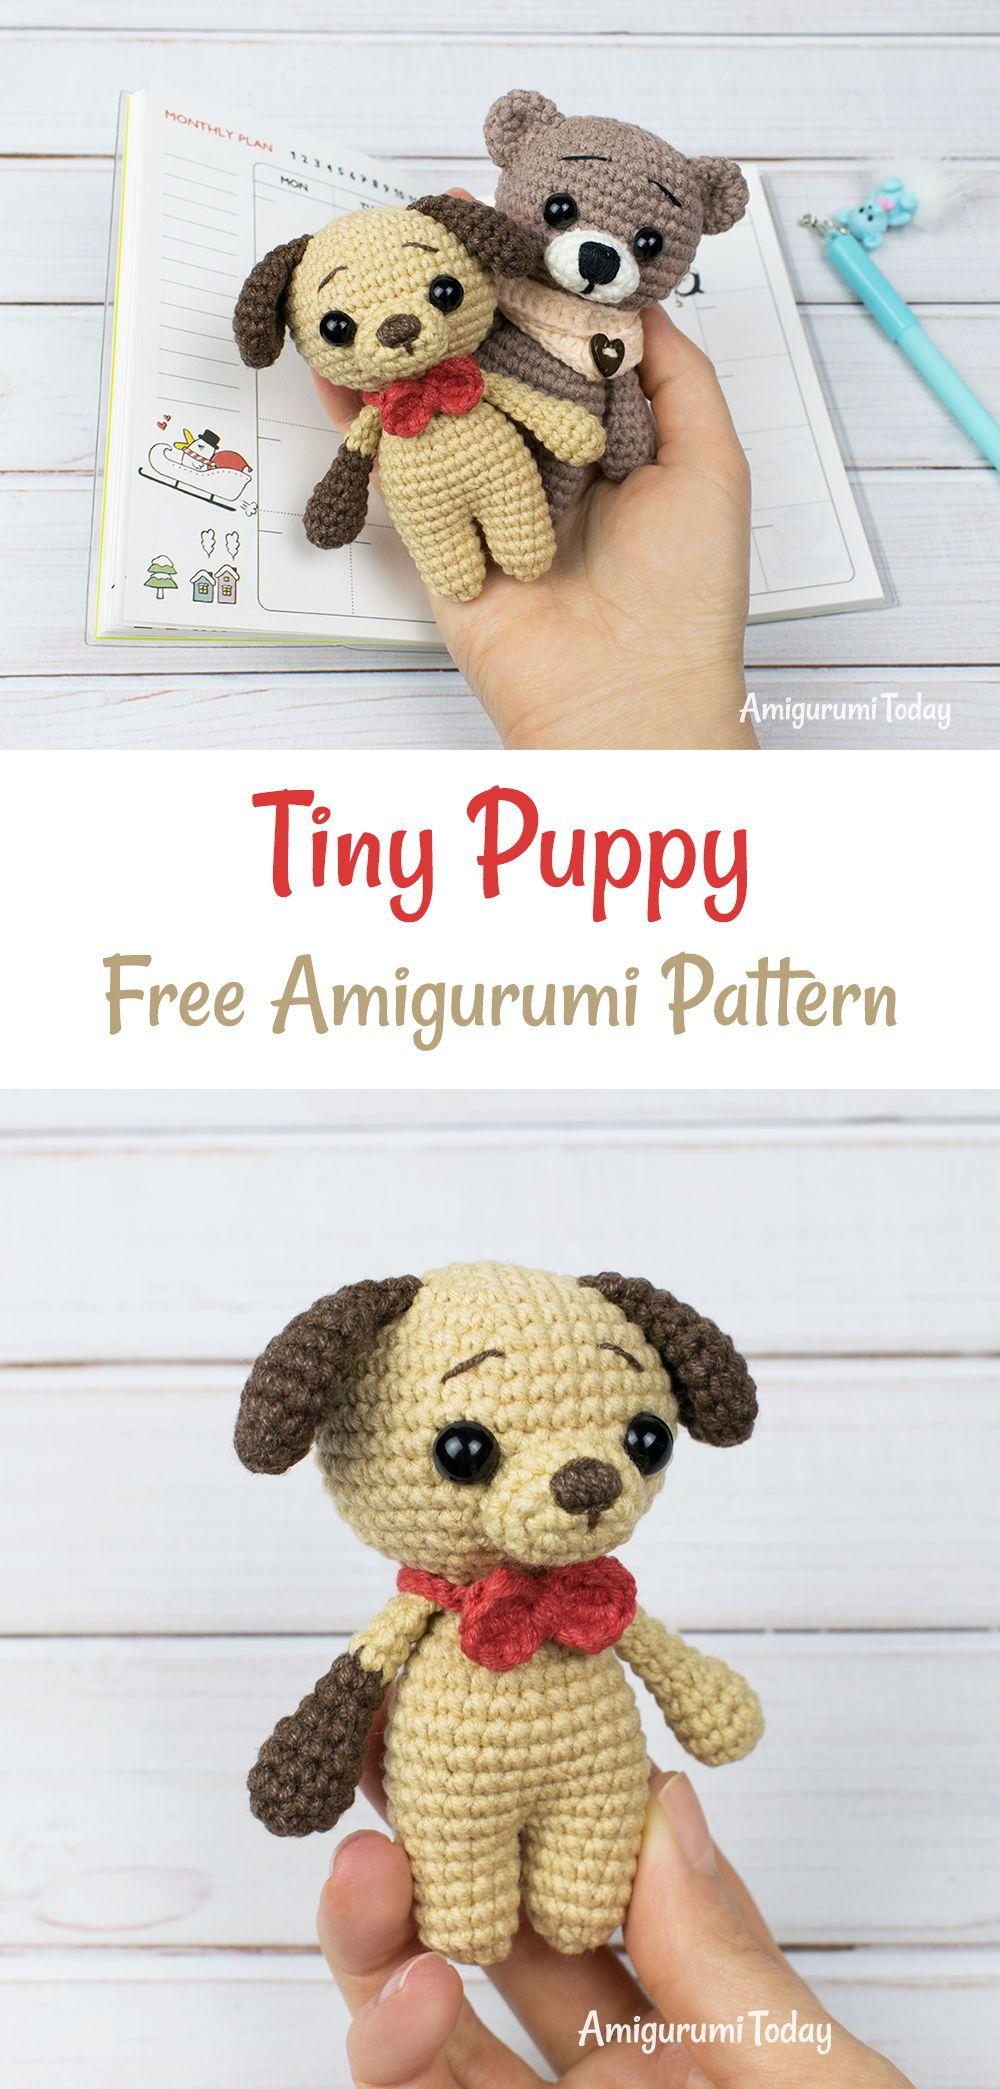 Amigurumi Sweet Dog Free Pattern | Crochet dog patterns, Crochet ... | 2089x1000